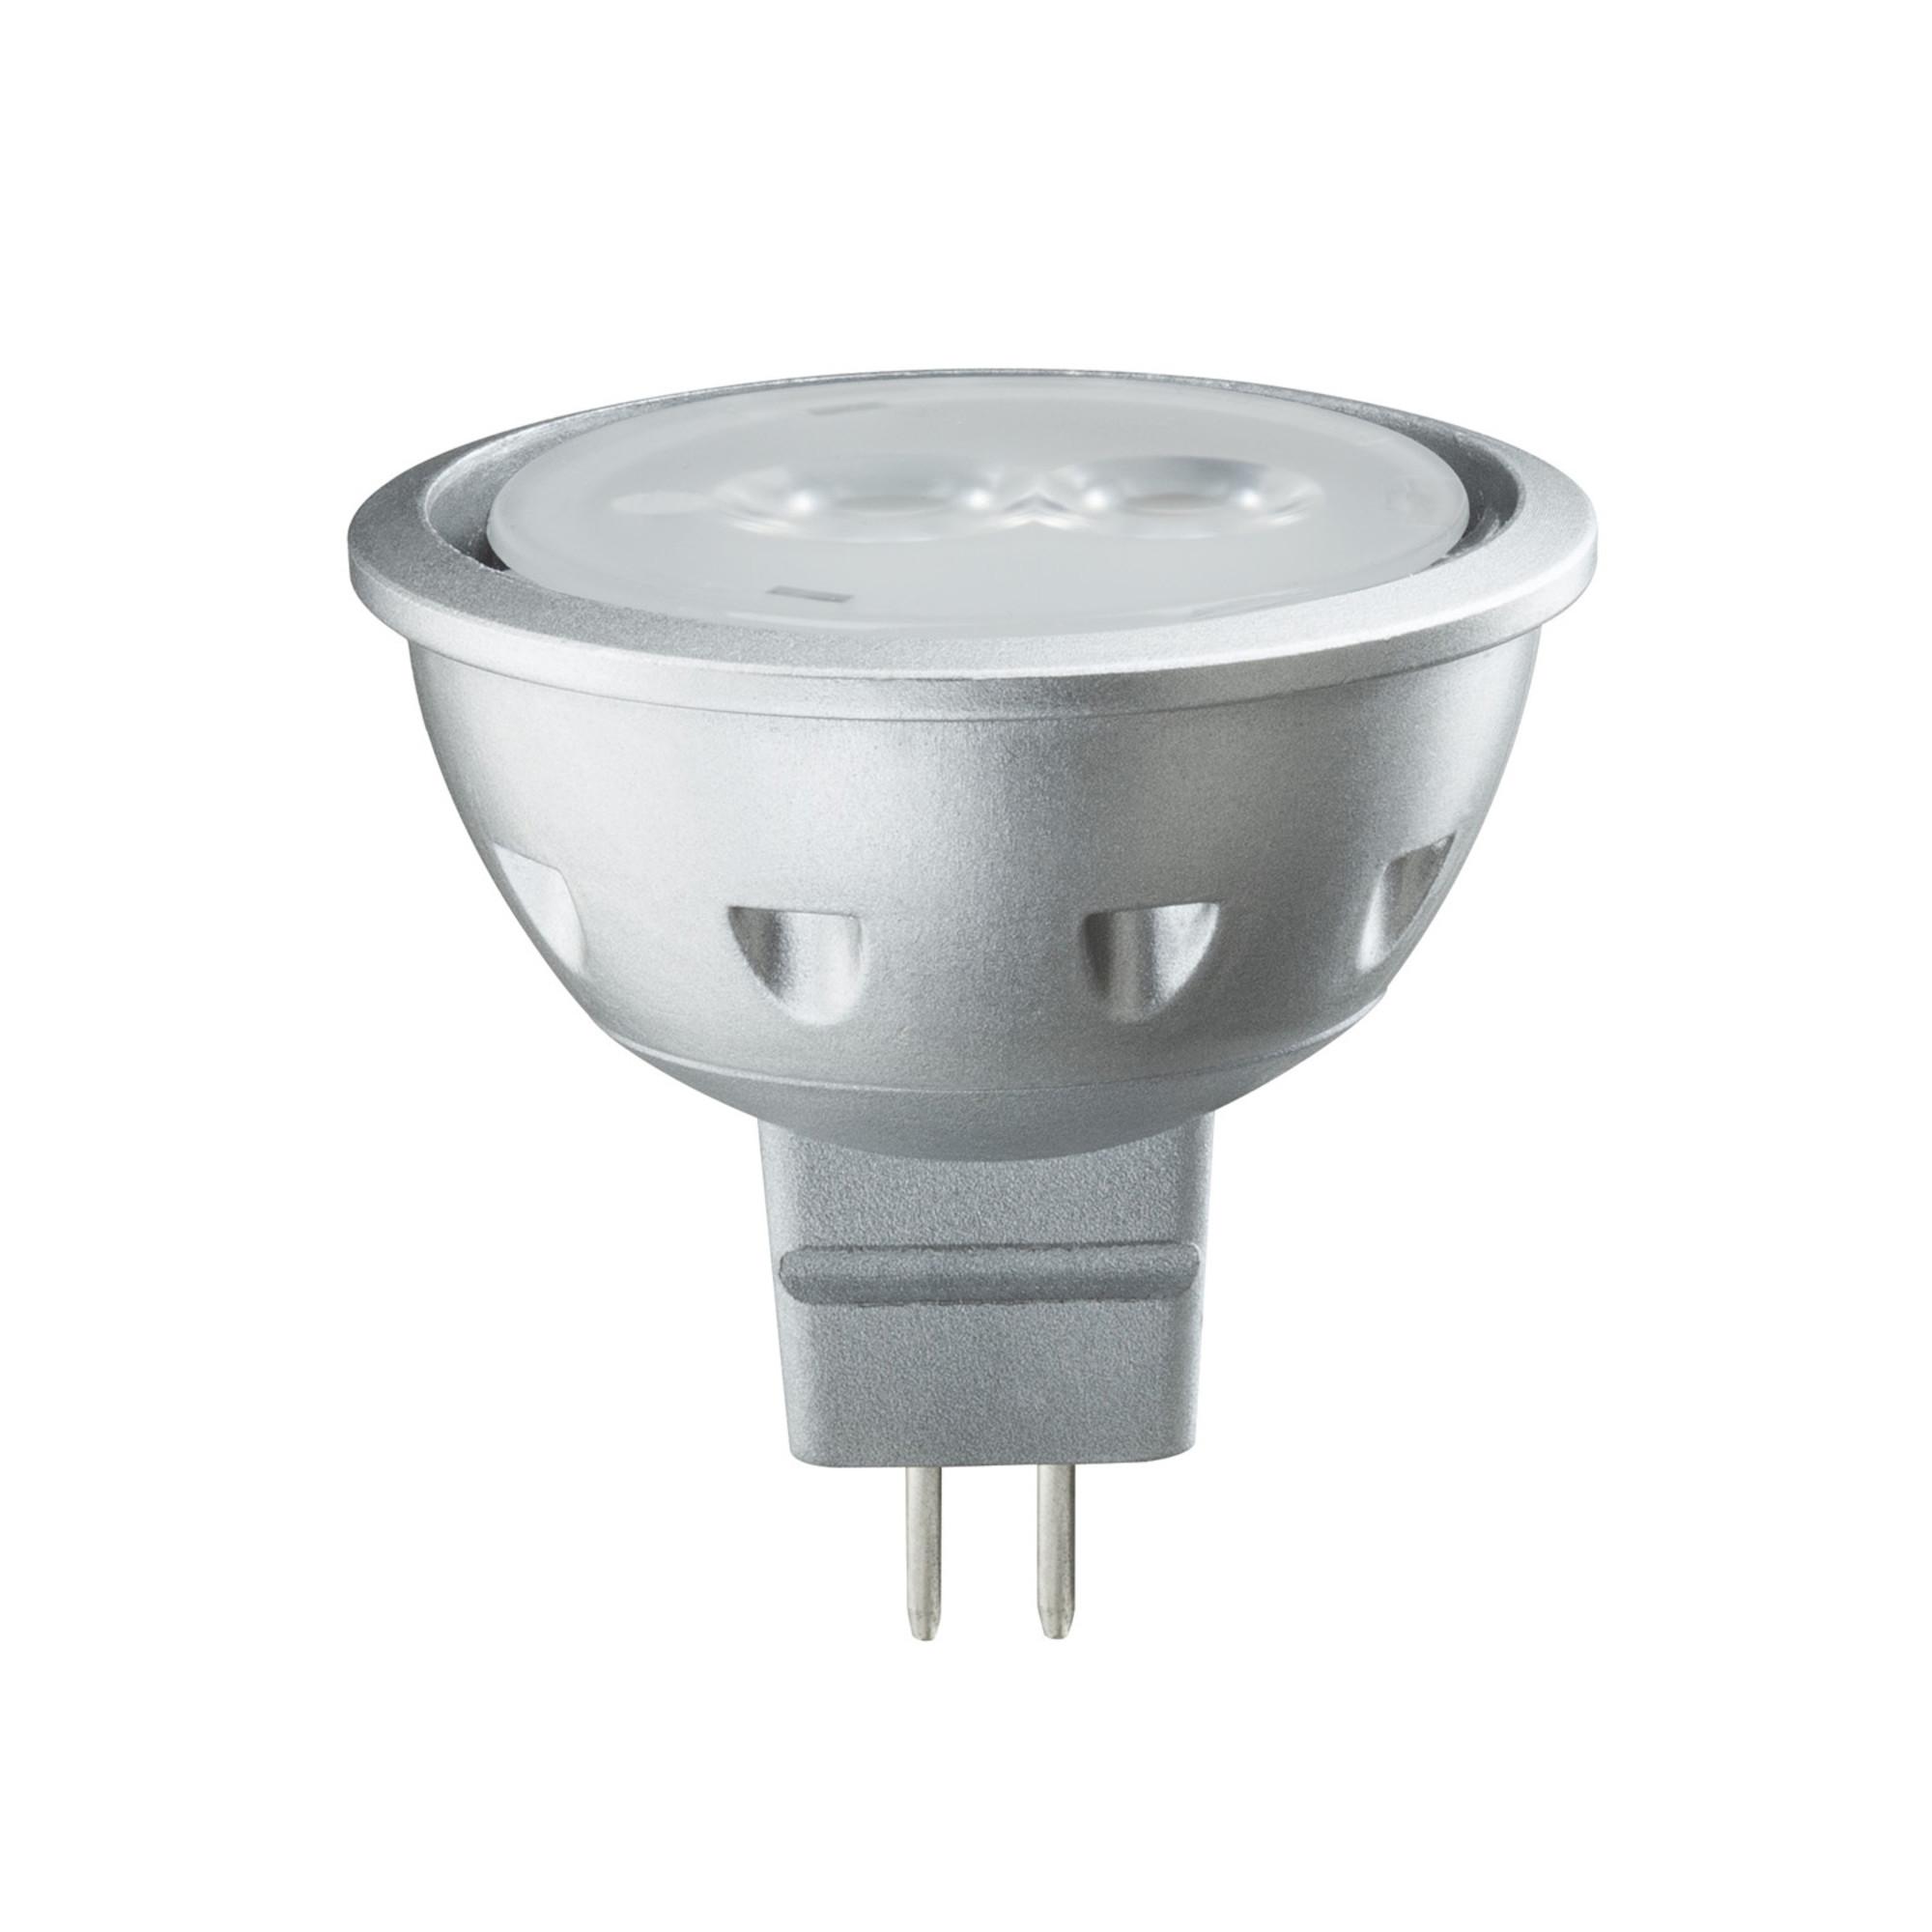 Лампа светодиодная Paulmann 28184 GU5.3 150 Лм теплый свет